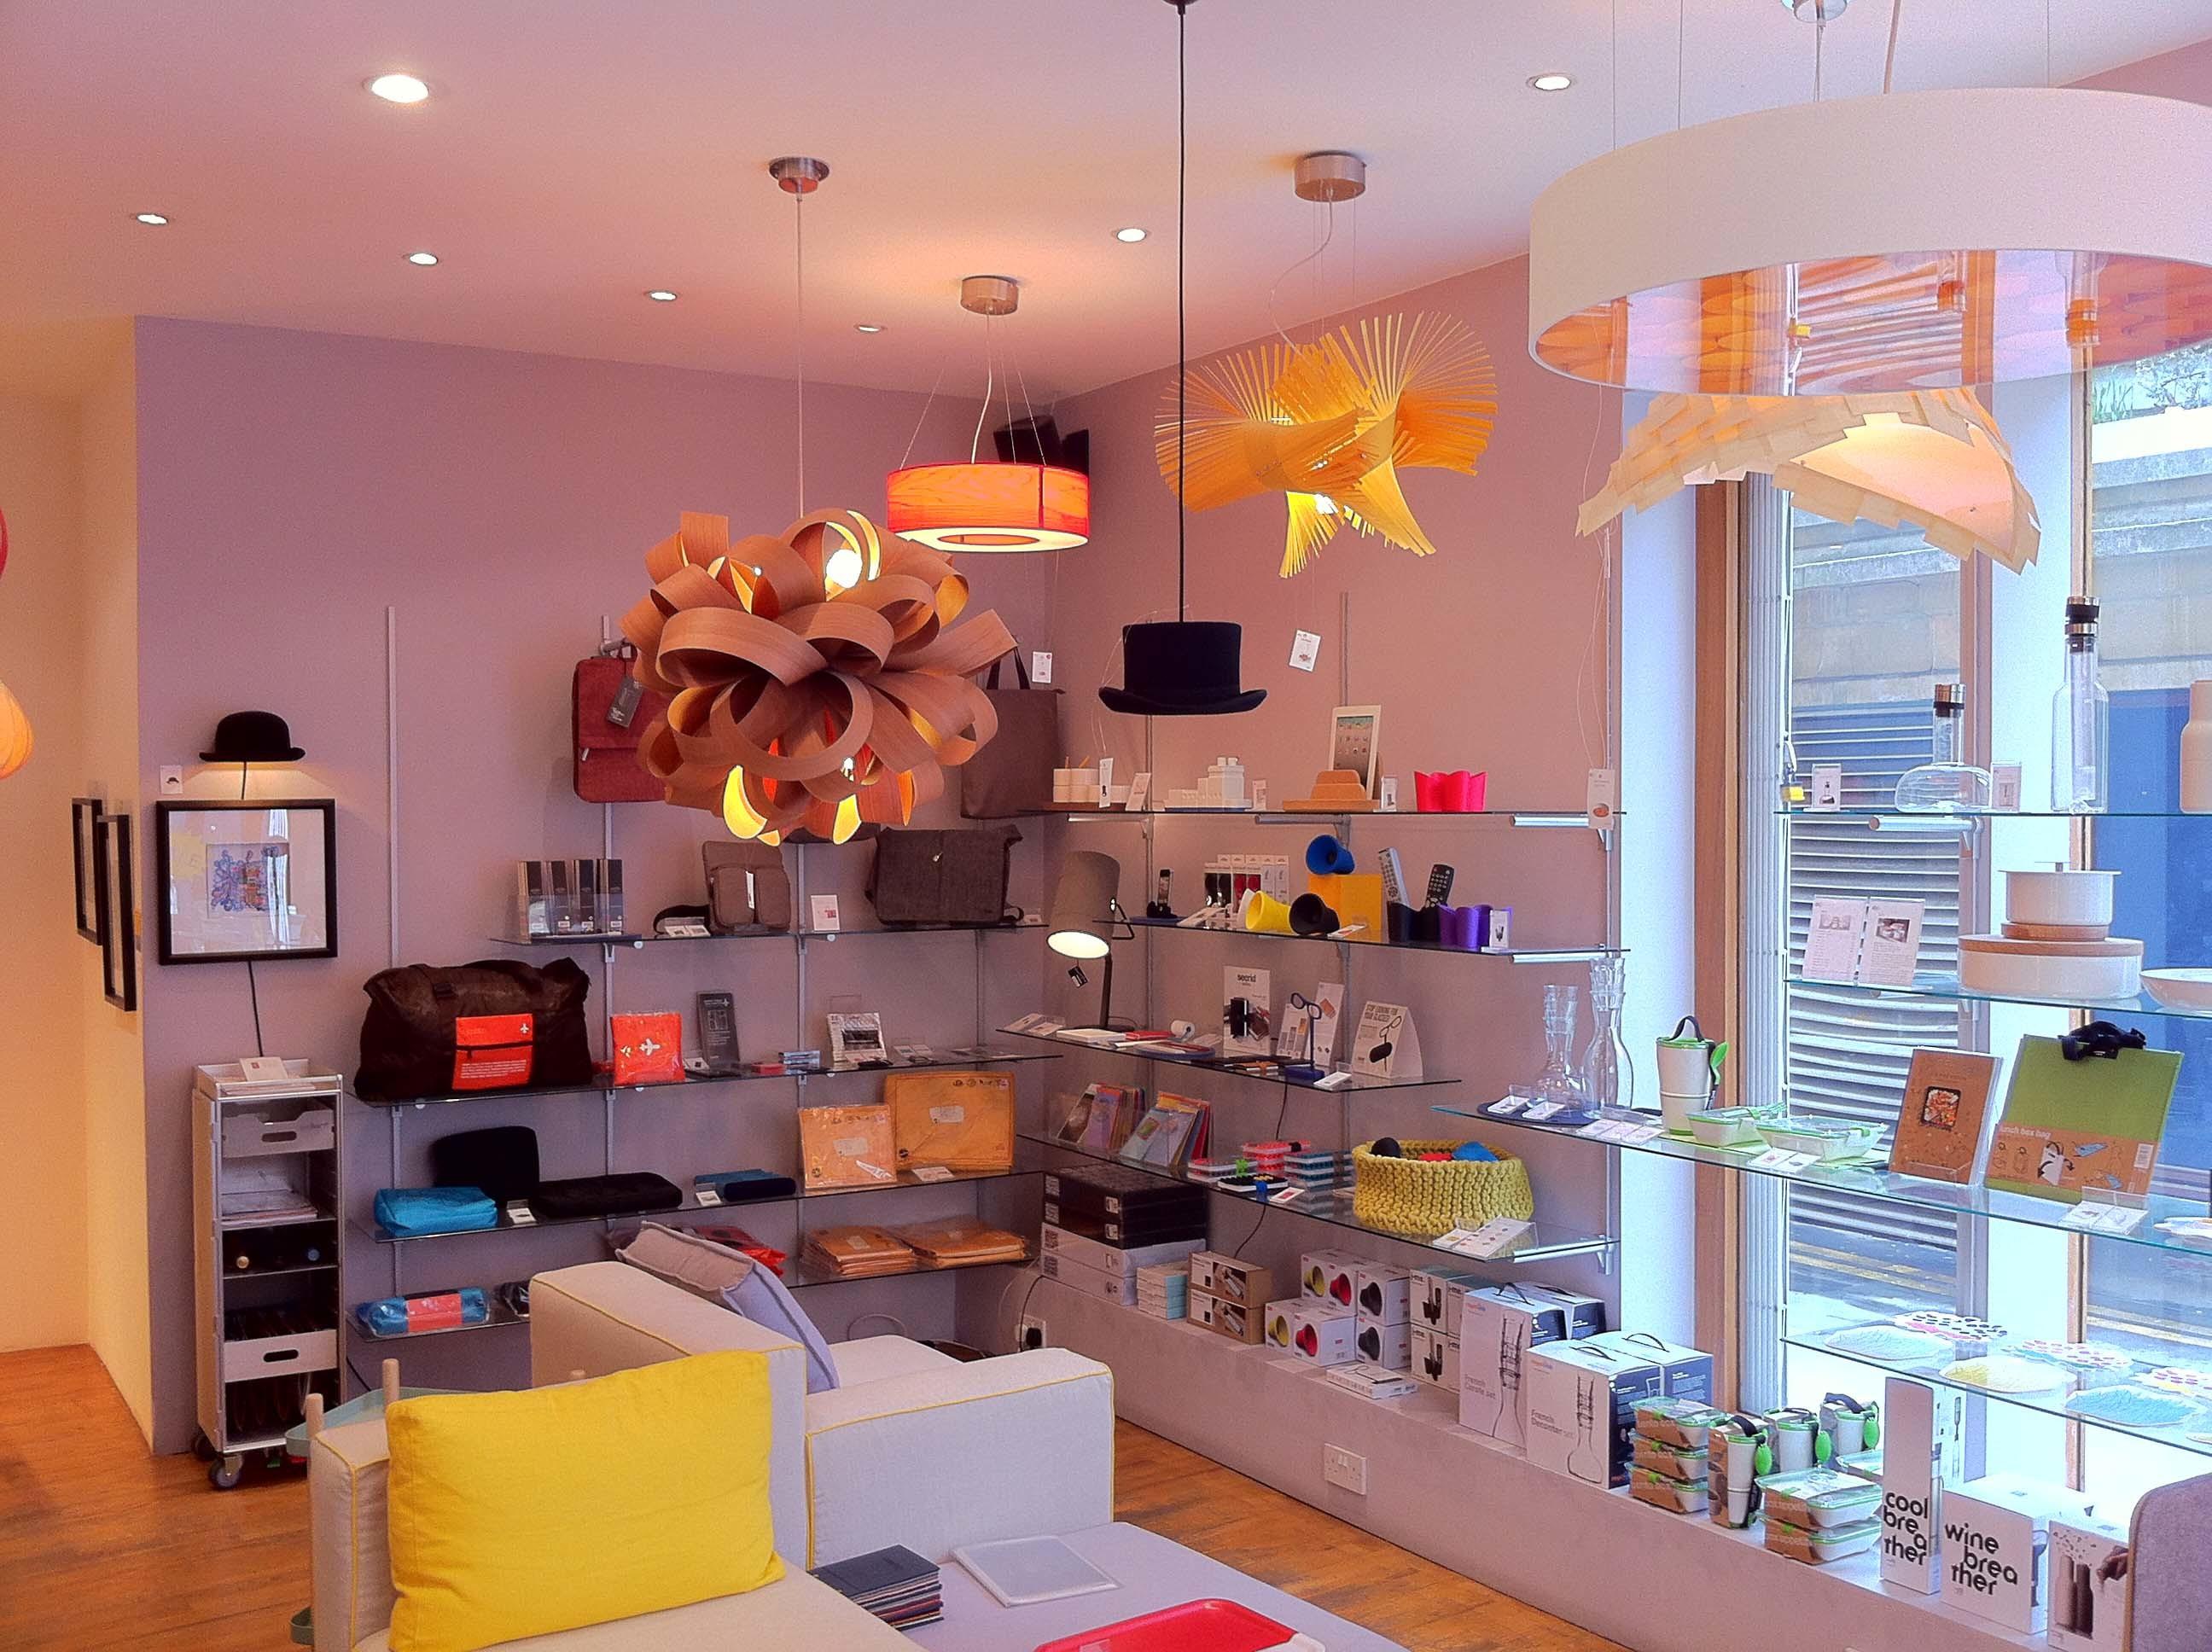 London's best furniture shops